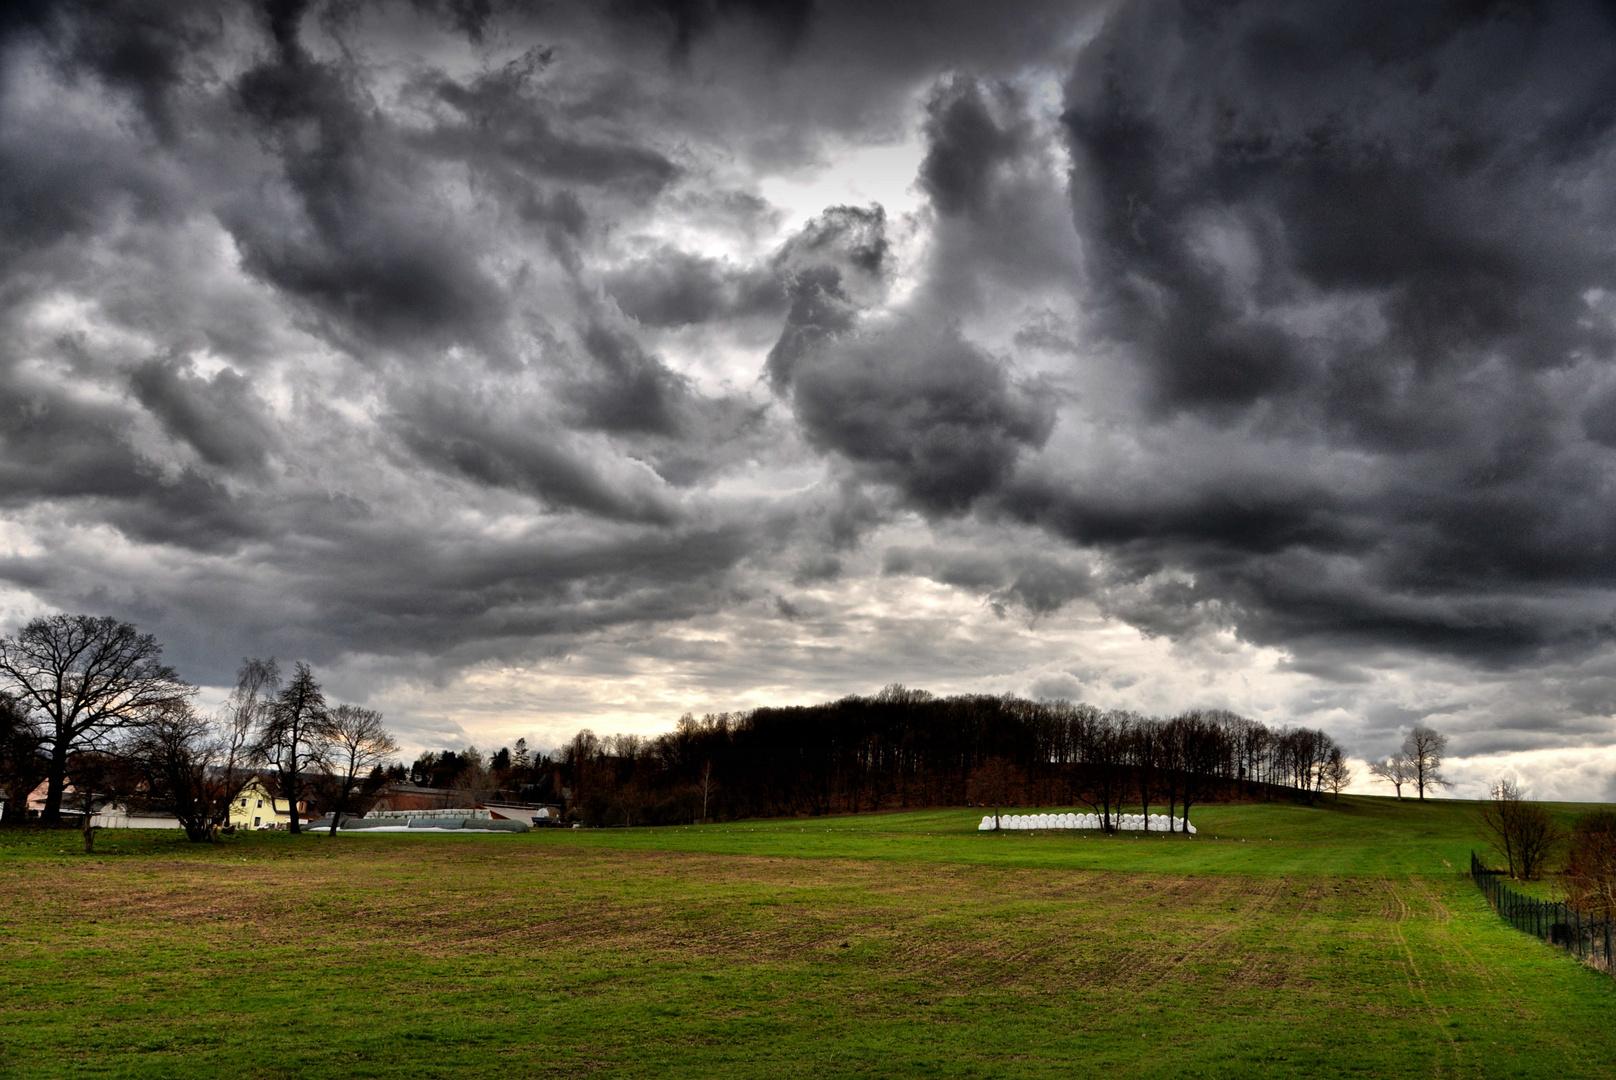 Vor dem Unwetter